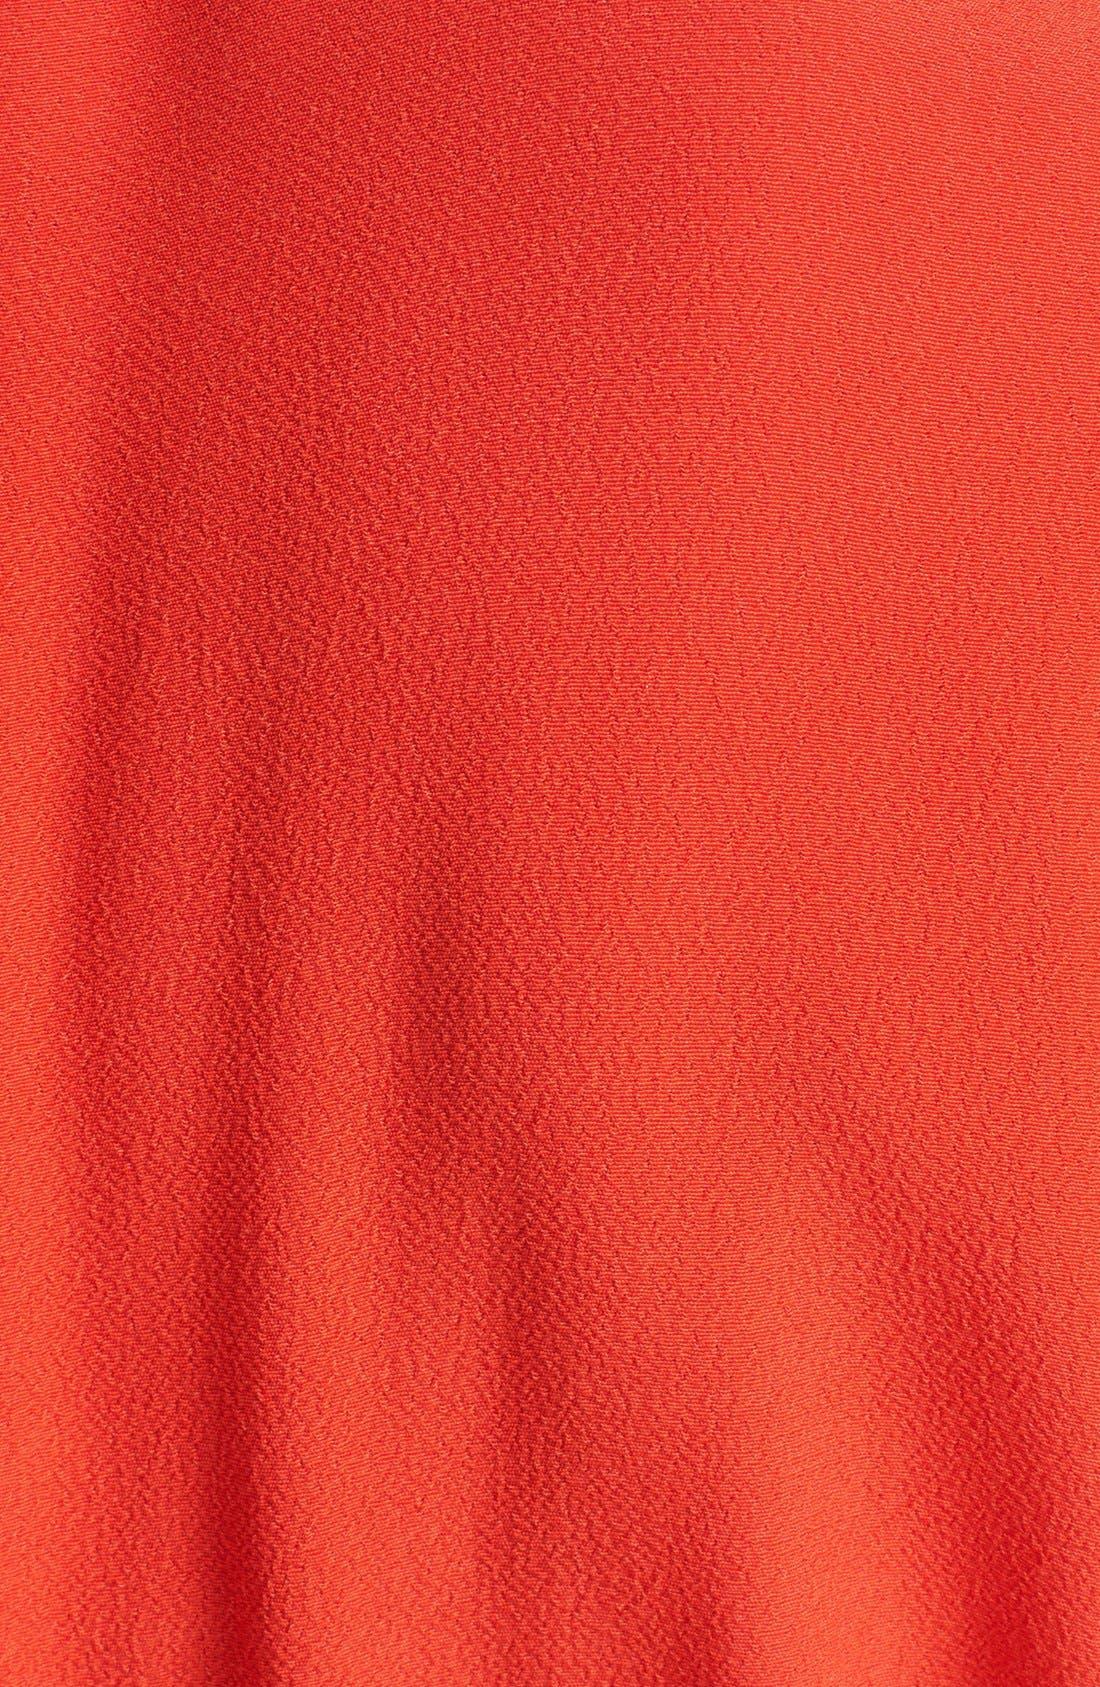 Alternate Image 3  - kate spade new york 'villa' sleeveless dress